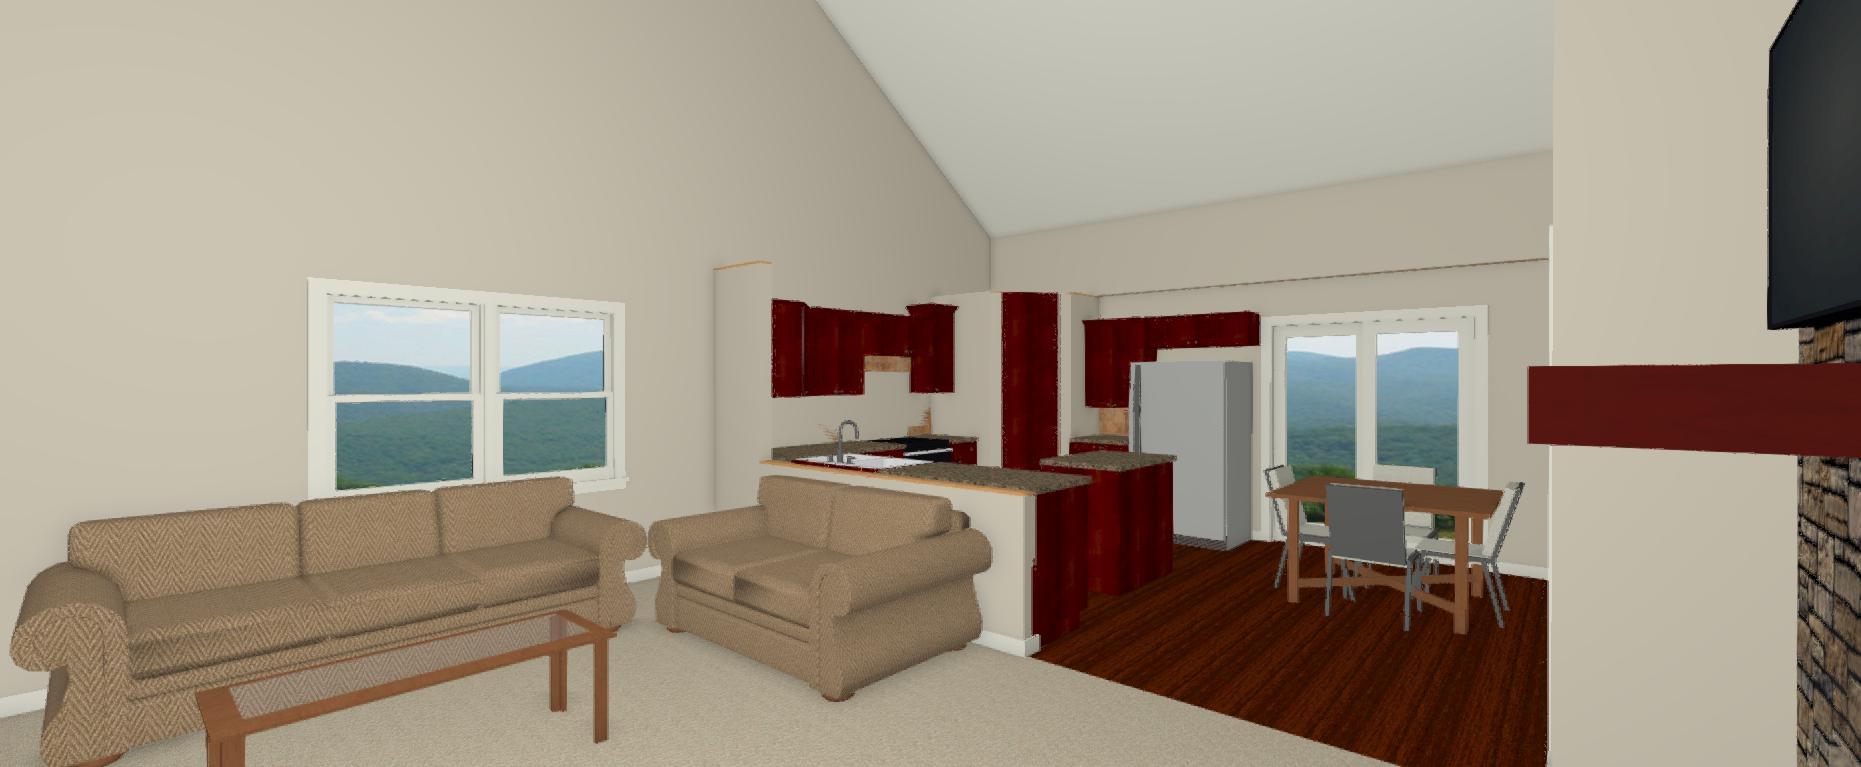 Holt 3D view